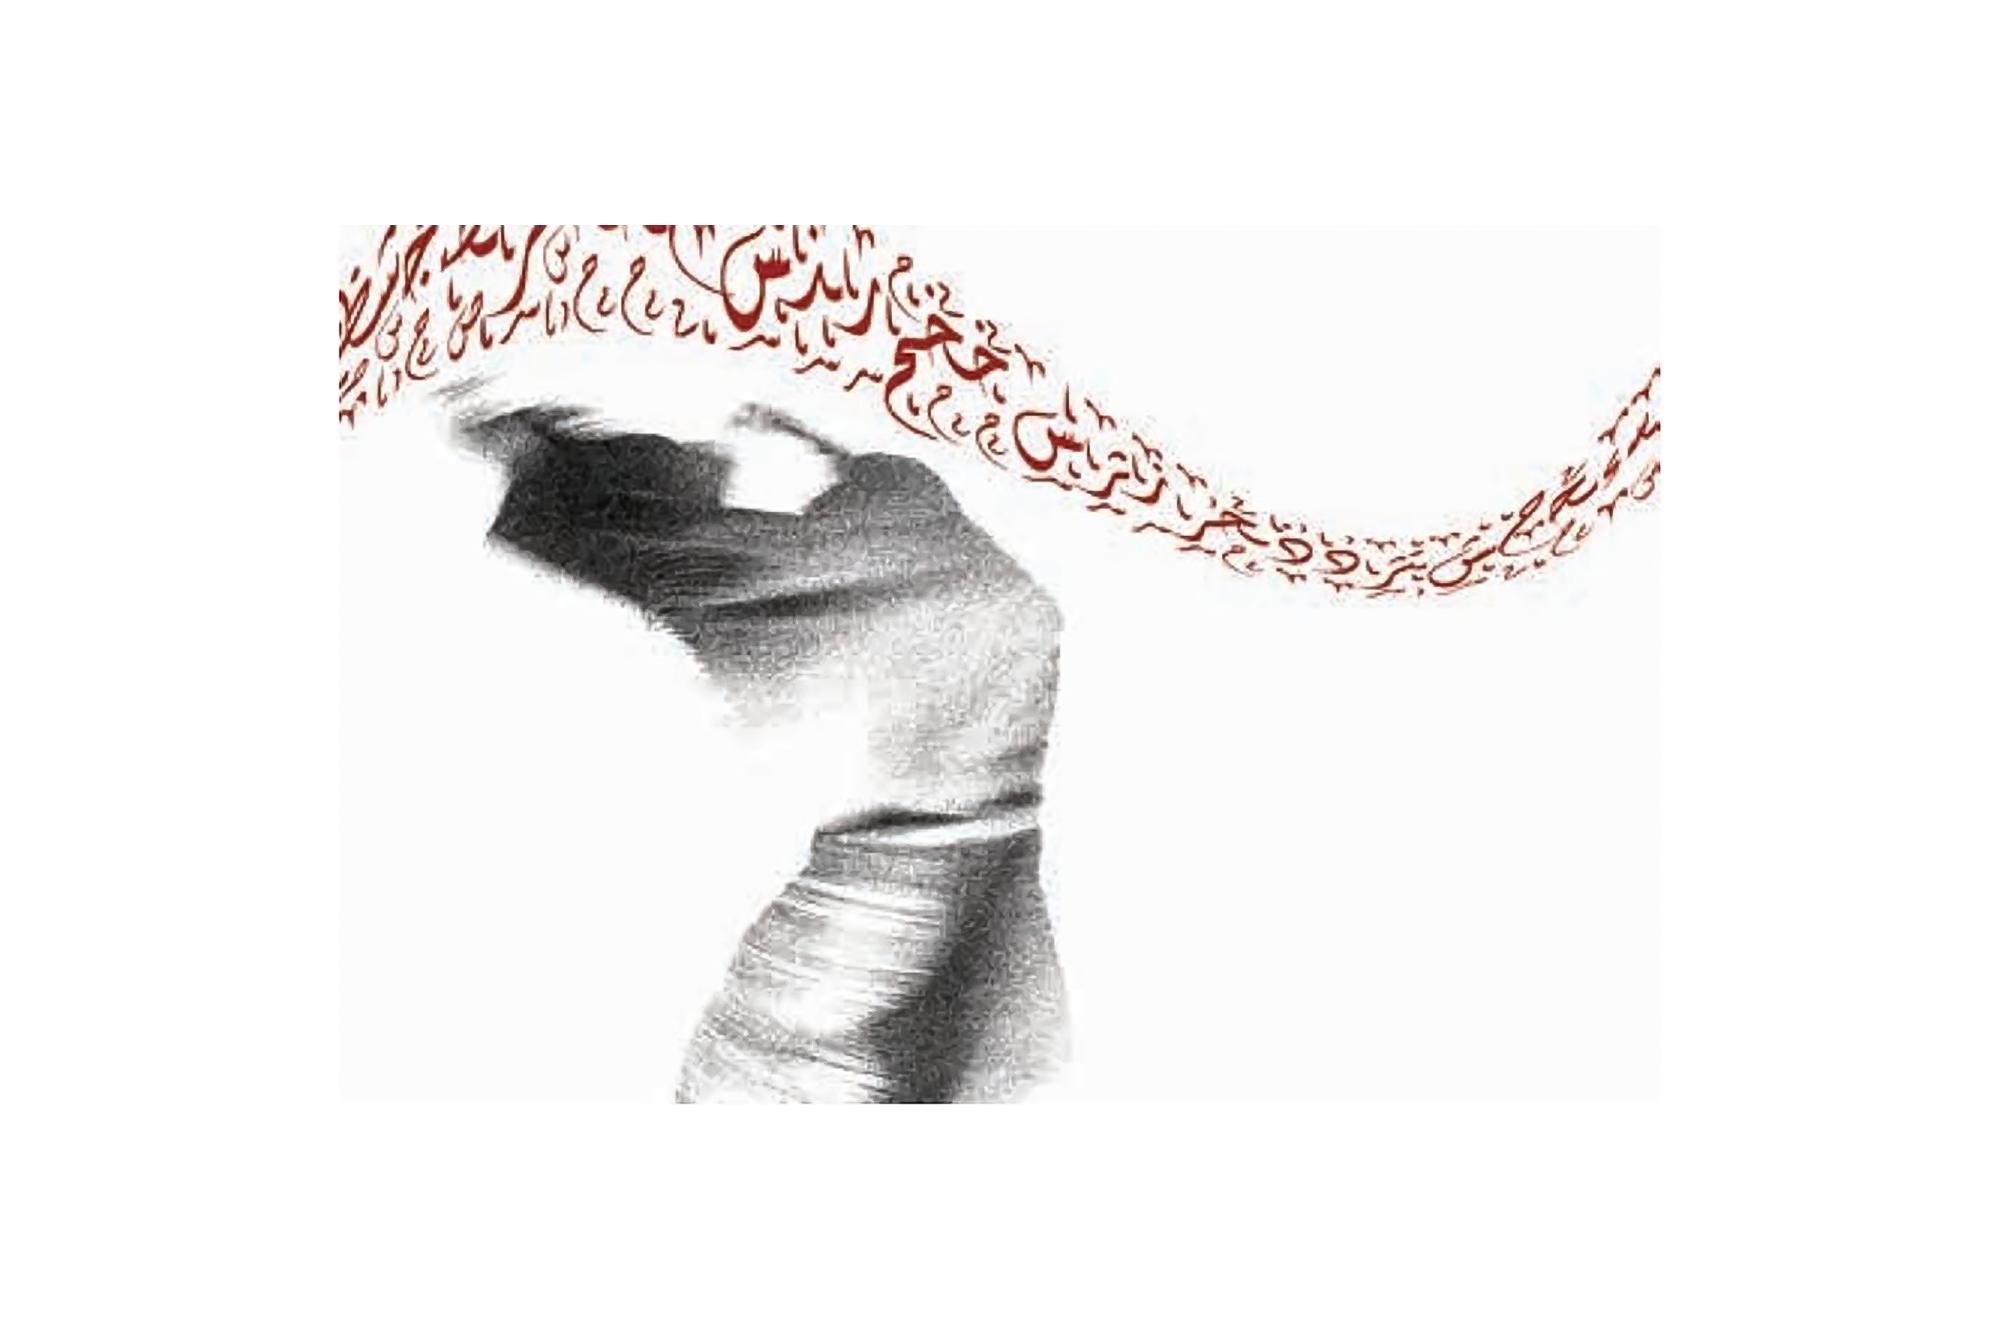 Shokufeh Malekkiani, Magic of Words, archival pigment print on hahnemuhle monet canvas, 100 x 150 cm, 2011